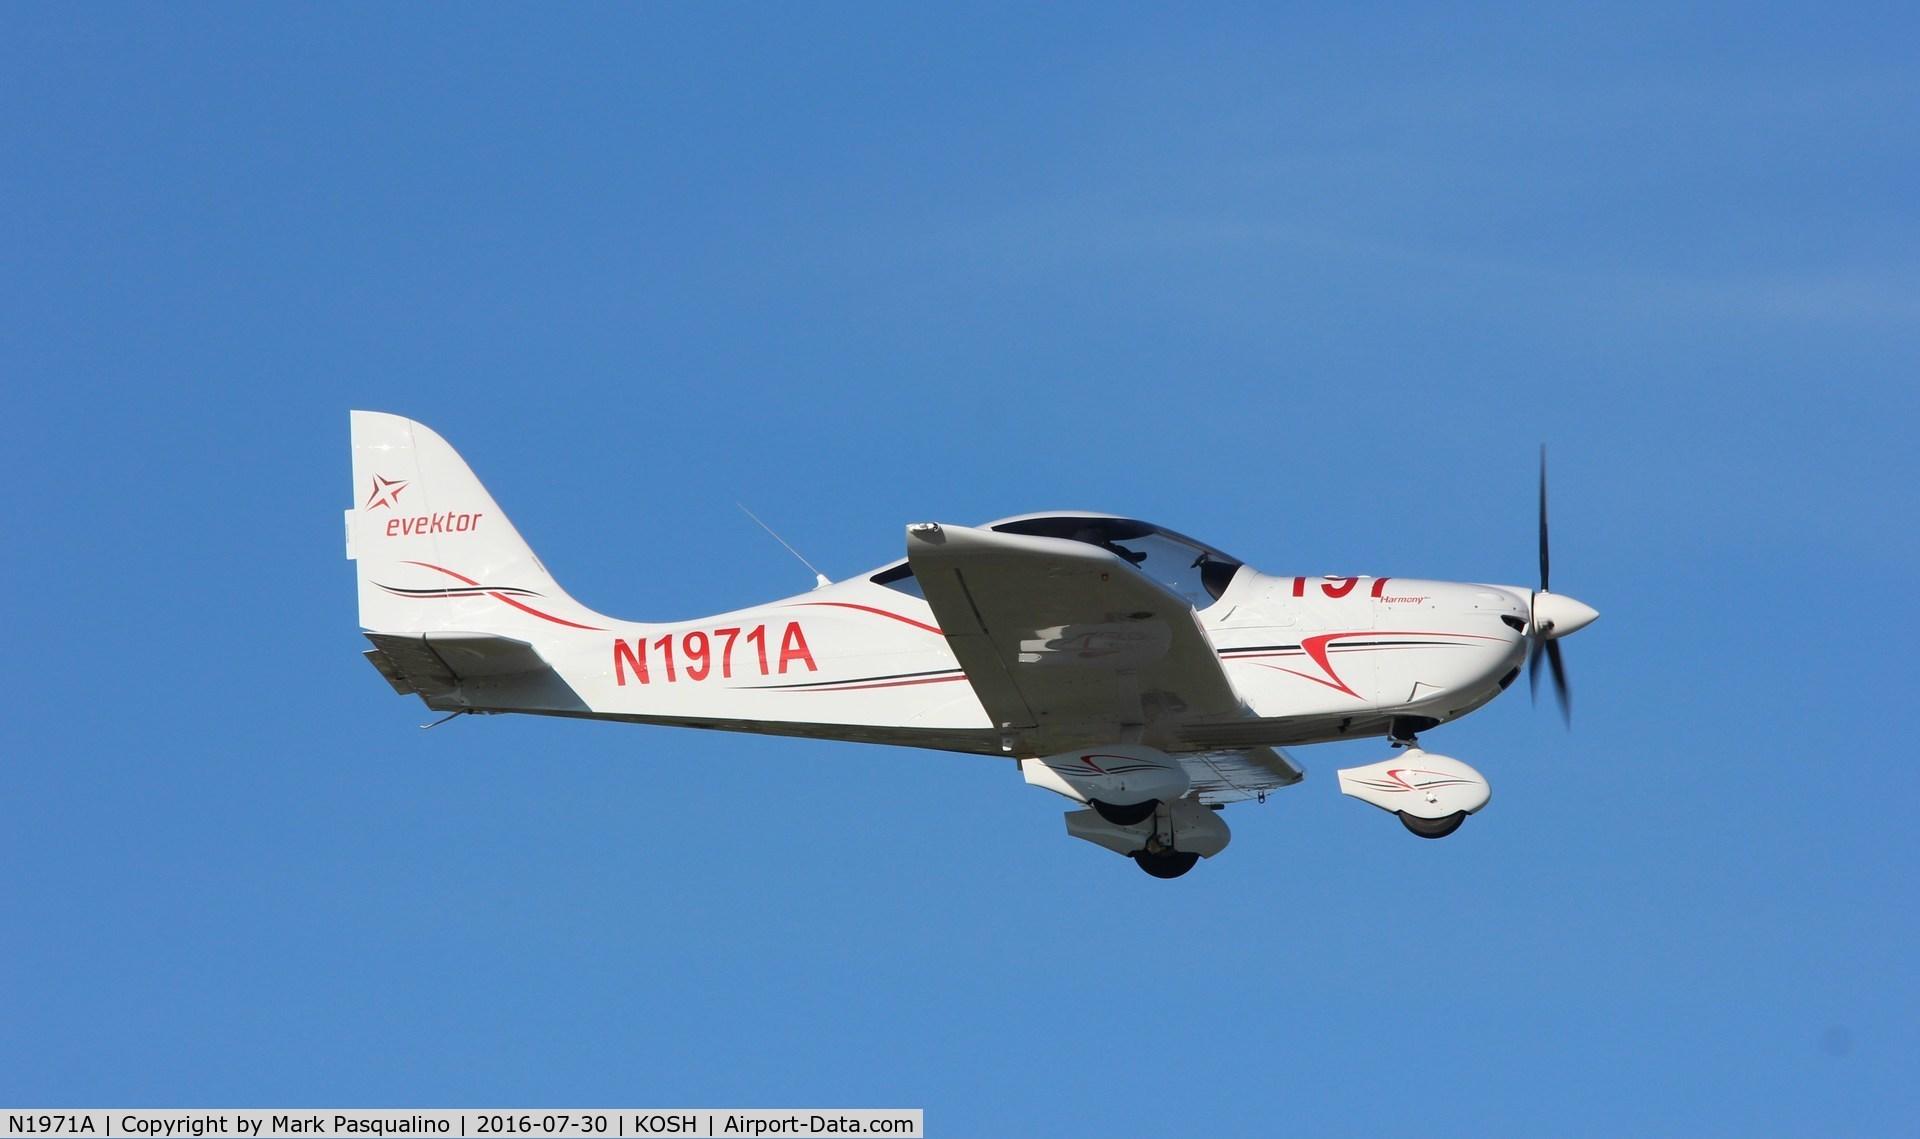 N1971A, 2014 Evektor-Aerotechnik Harmony LSA C/N 2014-1703, Evektor Harmony LSA